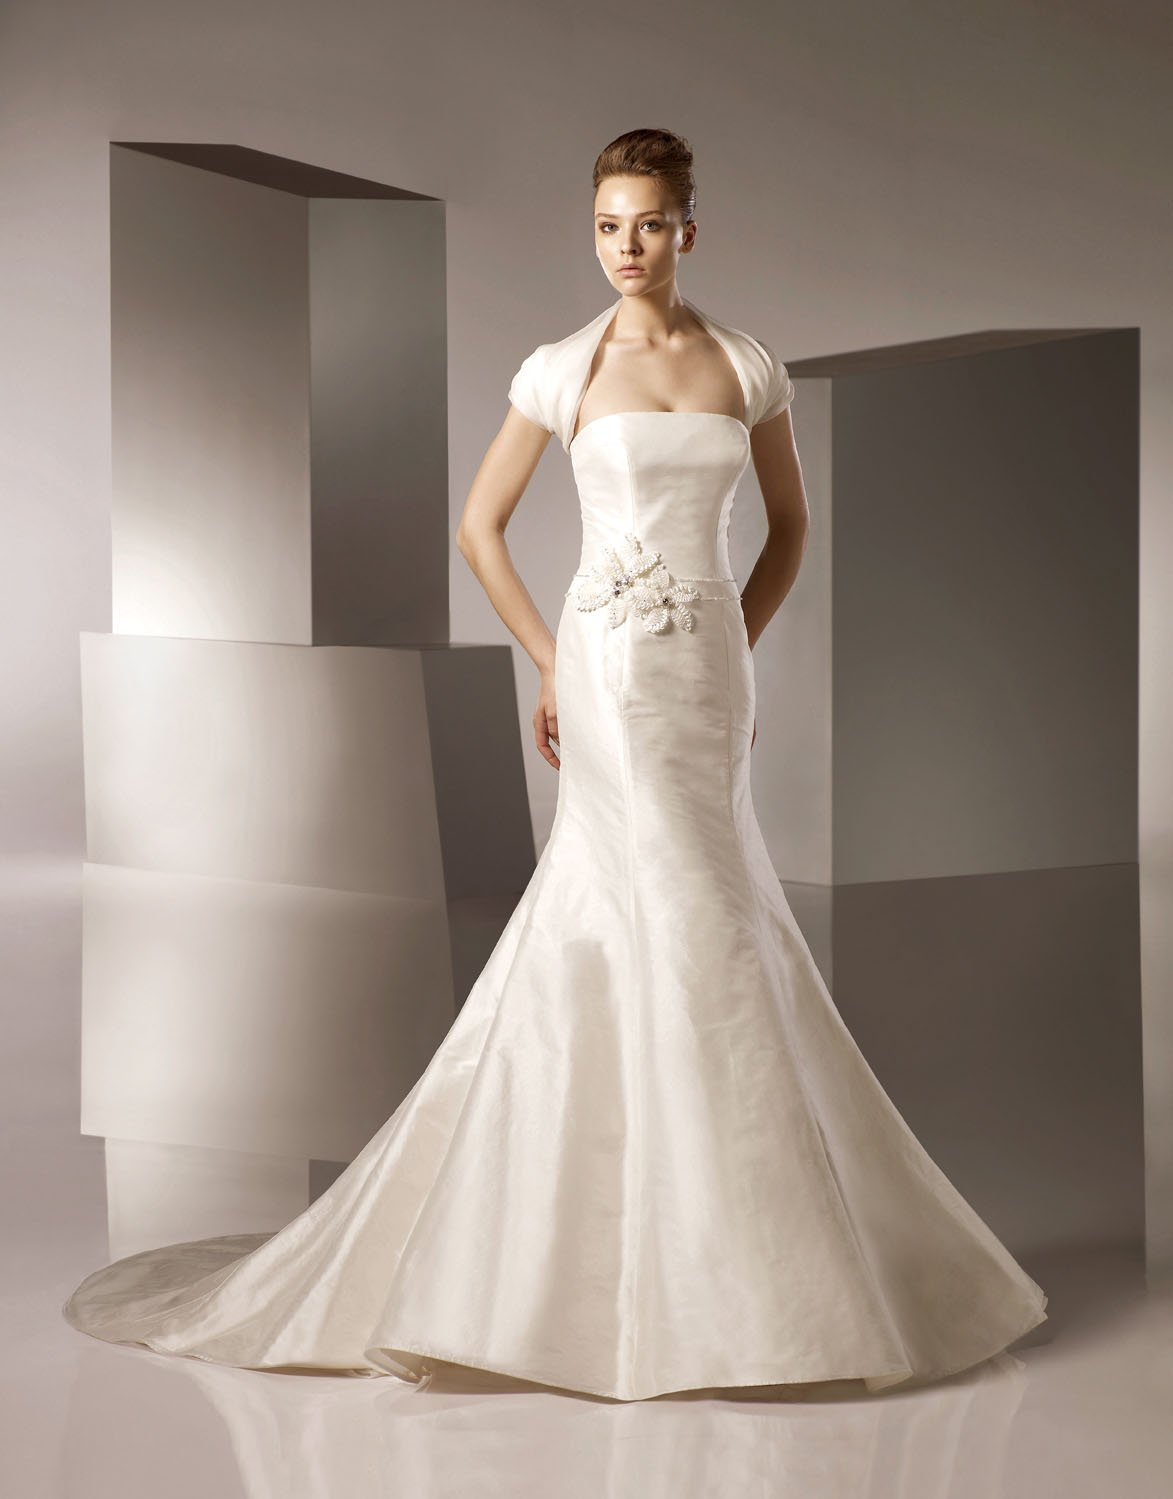 Mermaid Scoop Neckline Strapless Taffeta Wedding Dress Bridal Gown